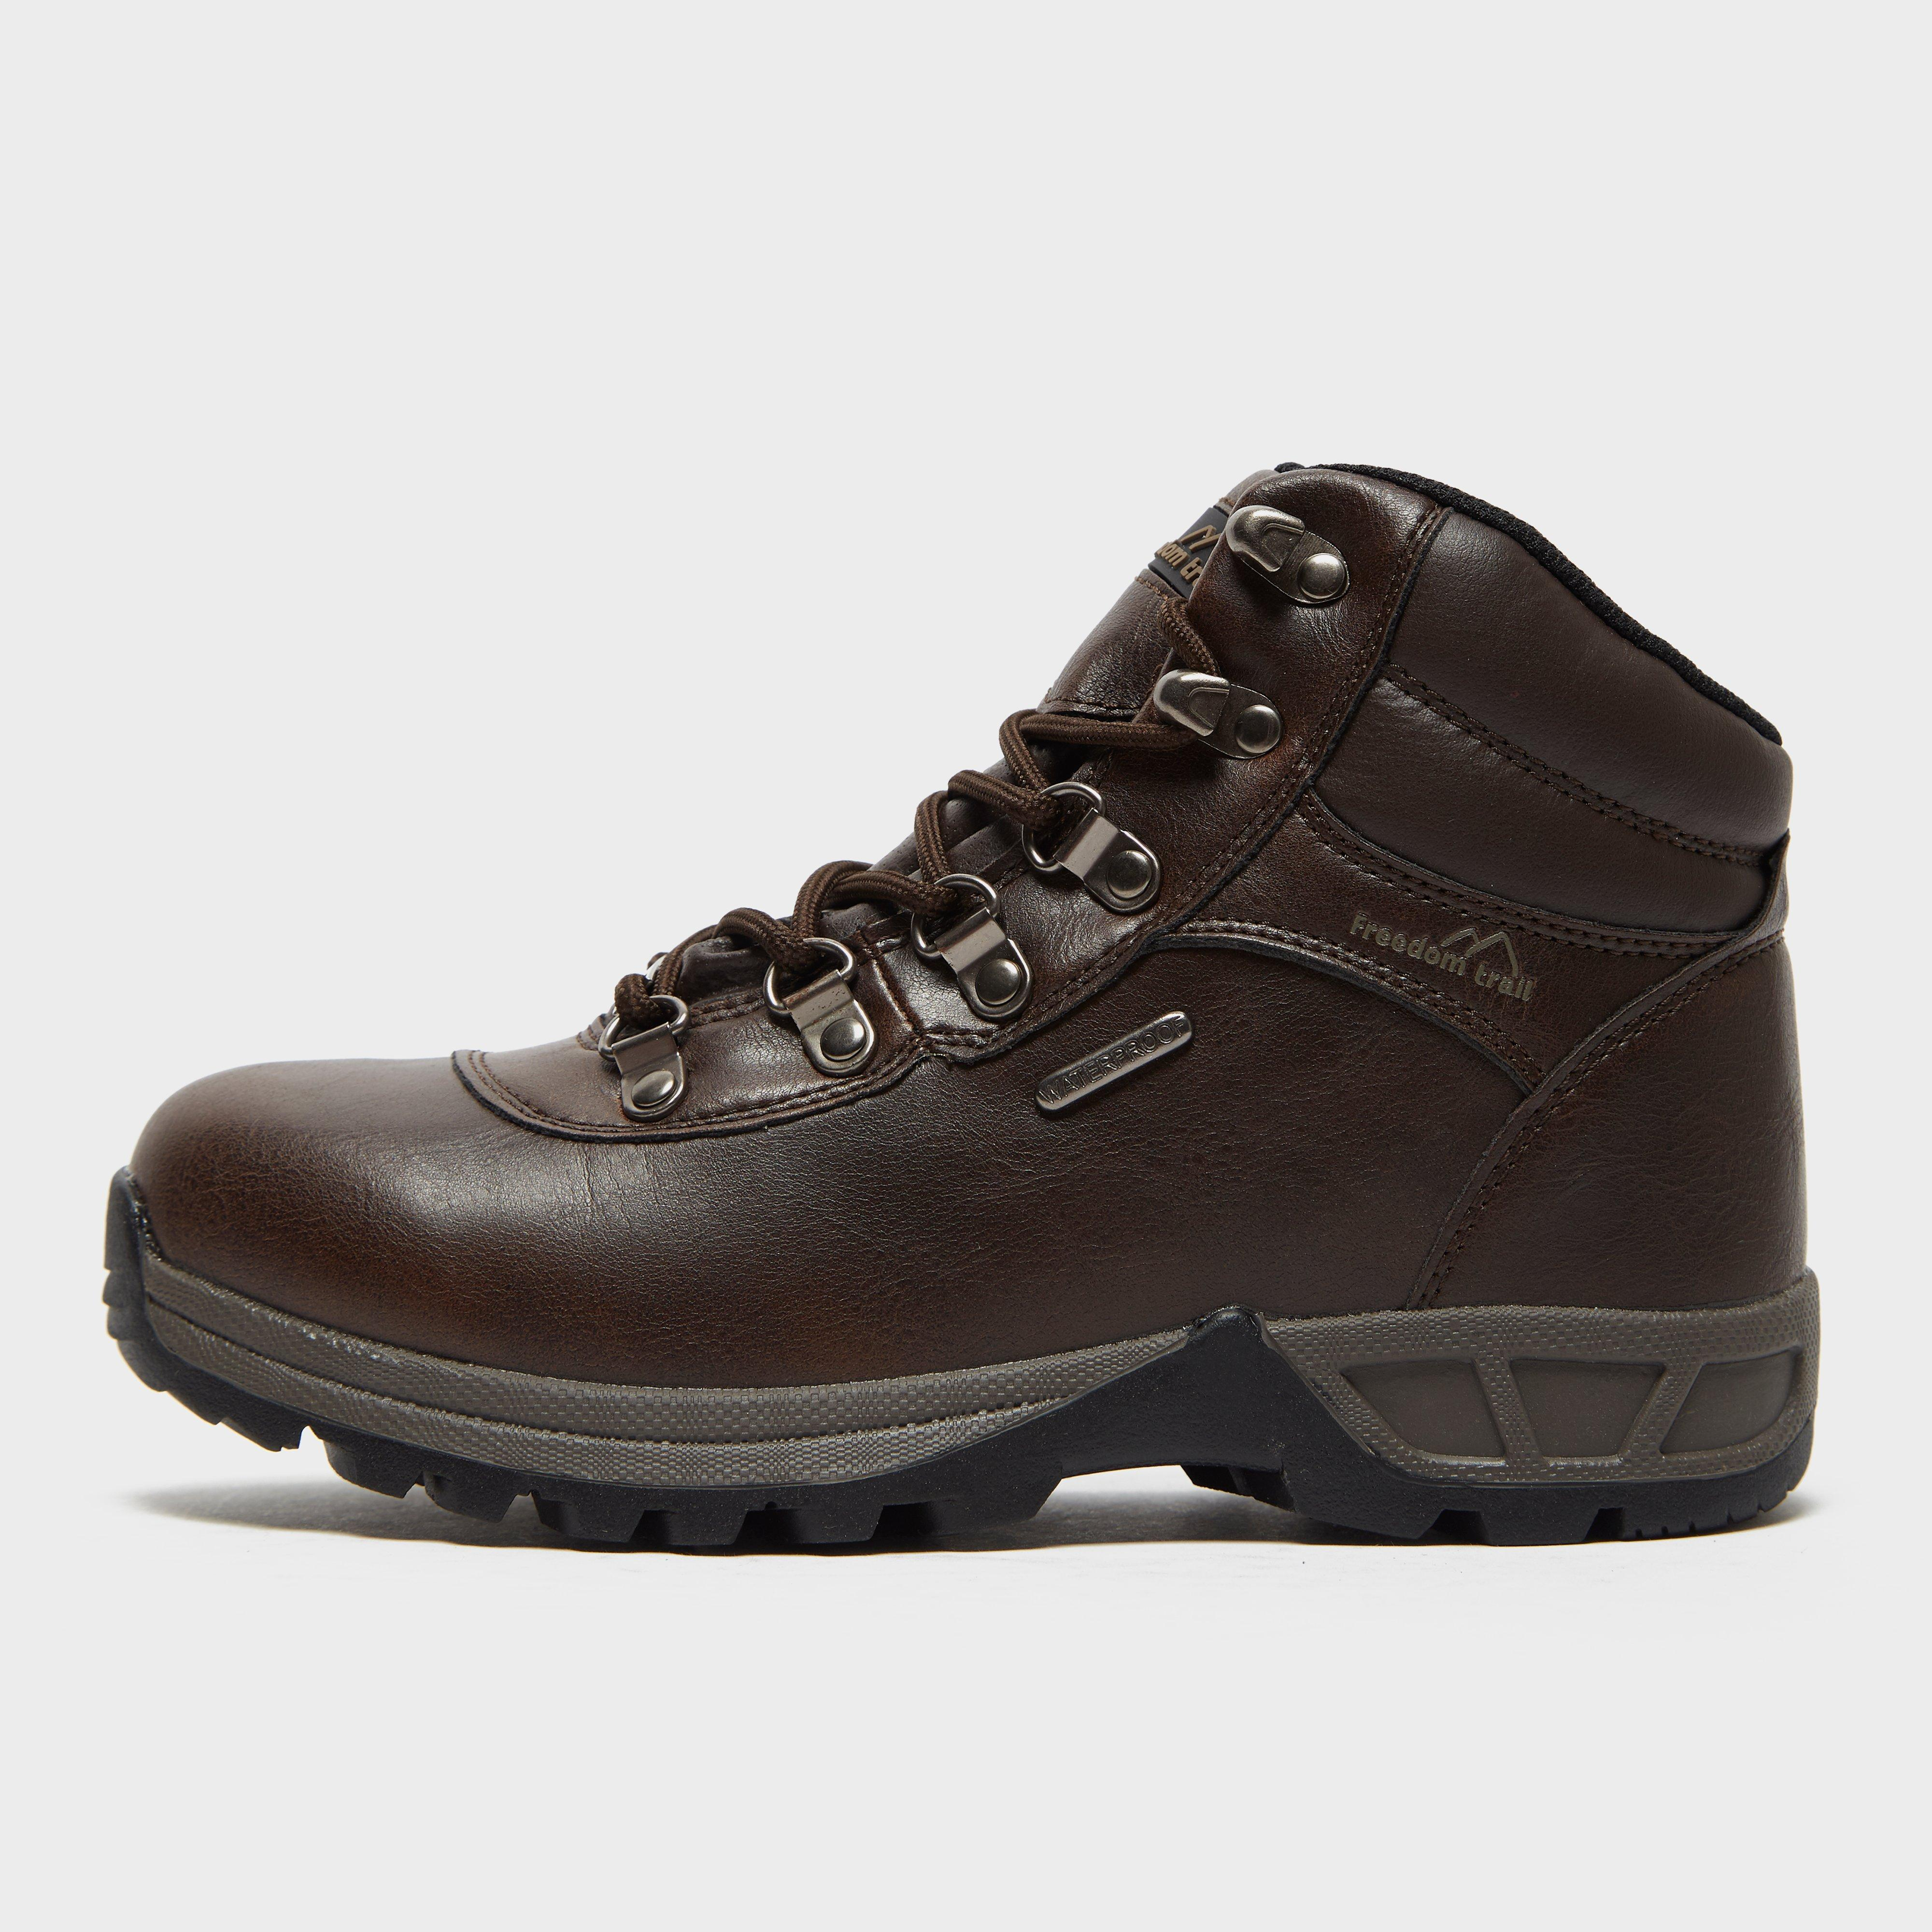 Freedomtrail Kids' Rivelin Walking Boots - Brown, Brown